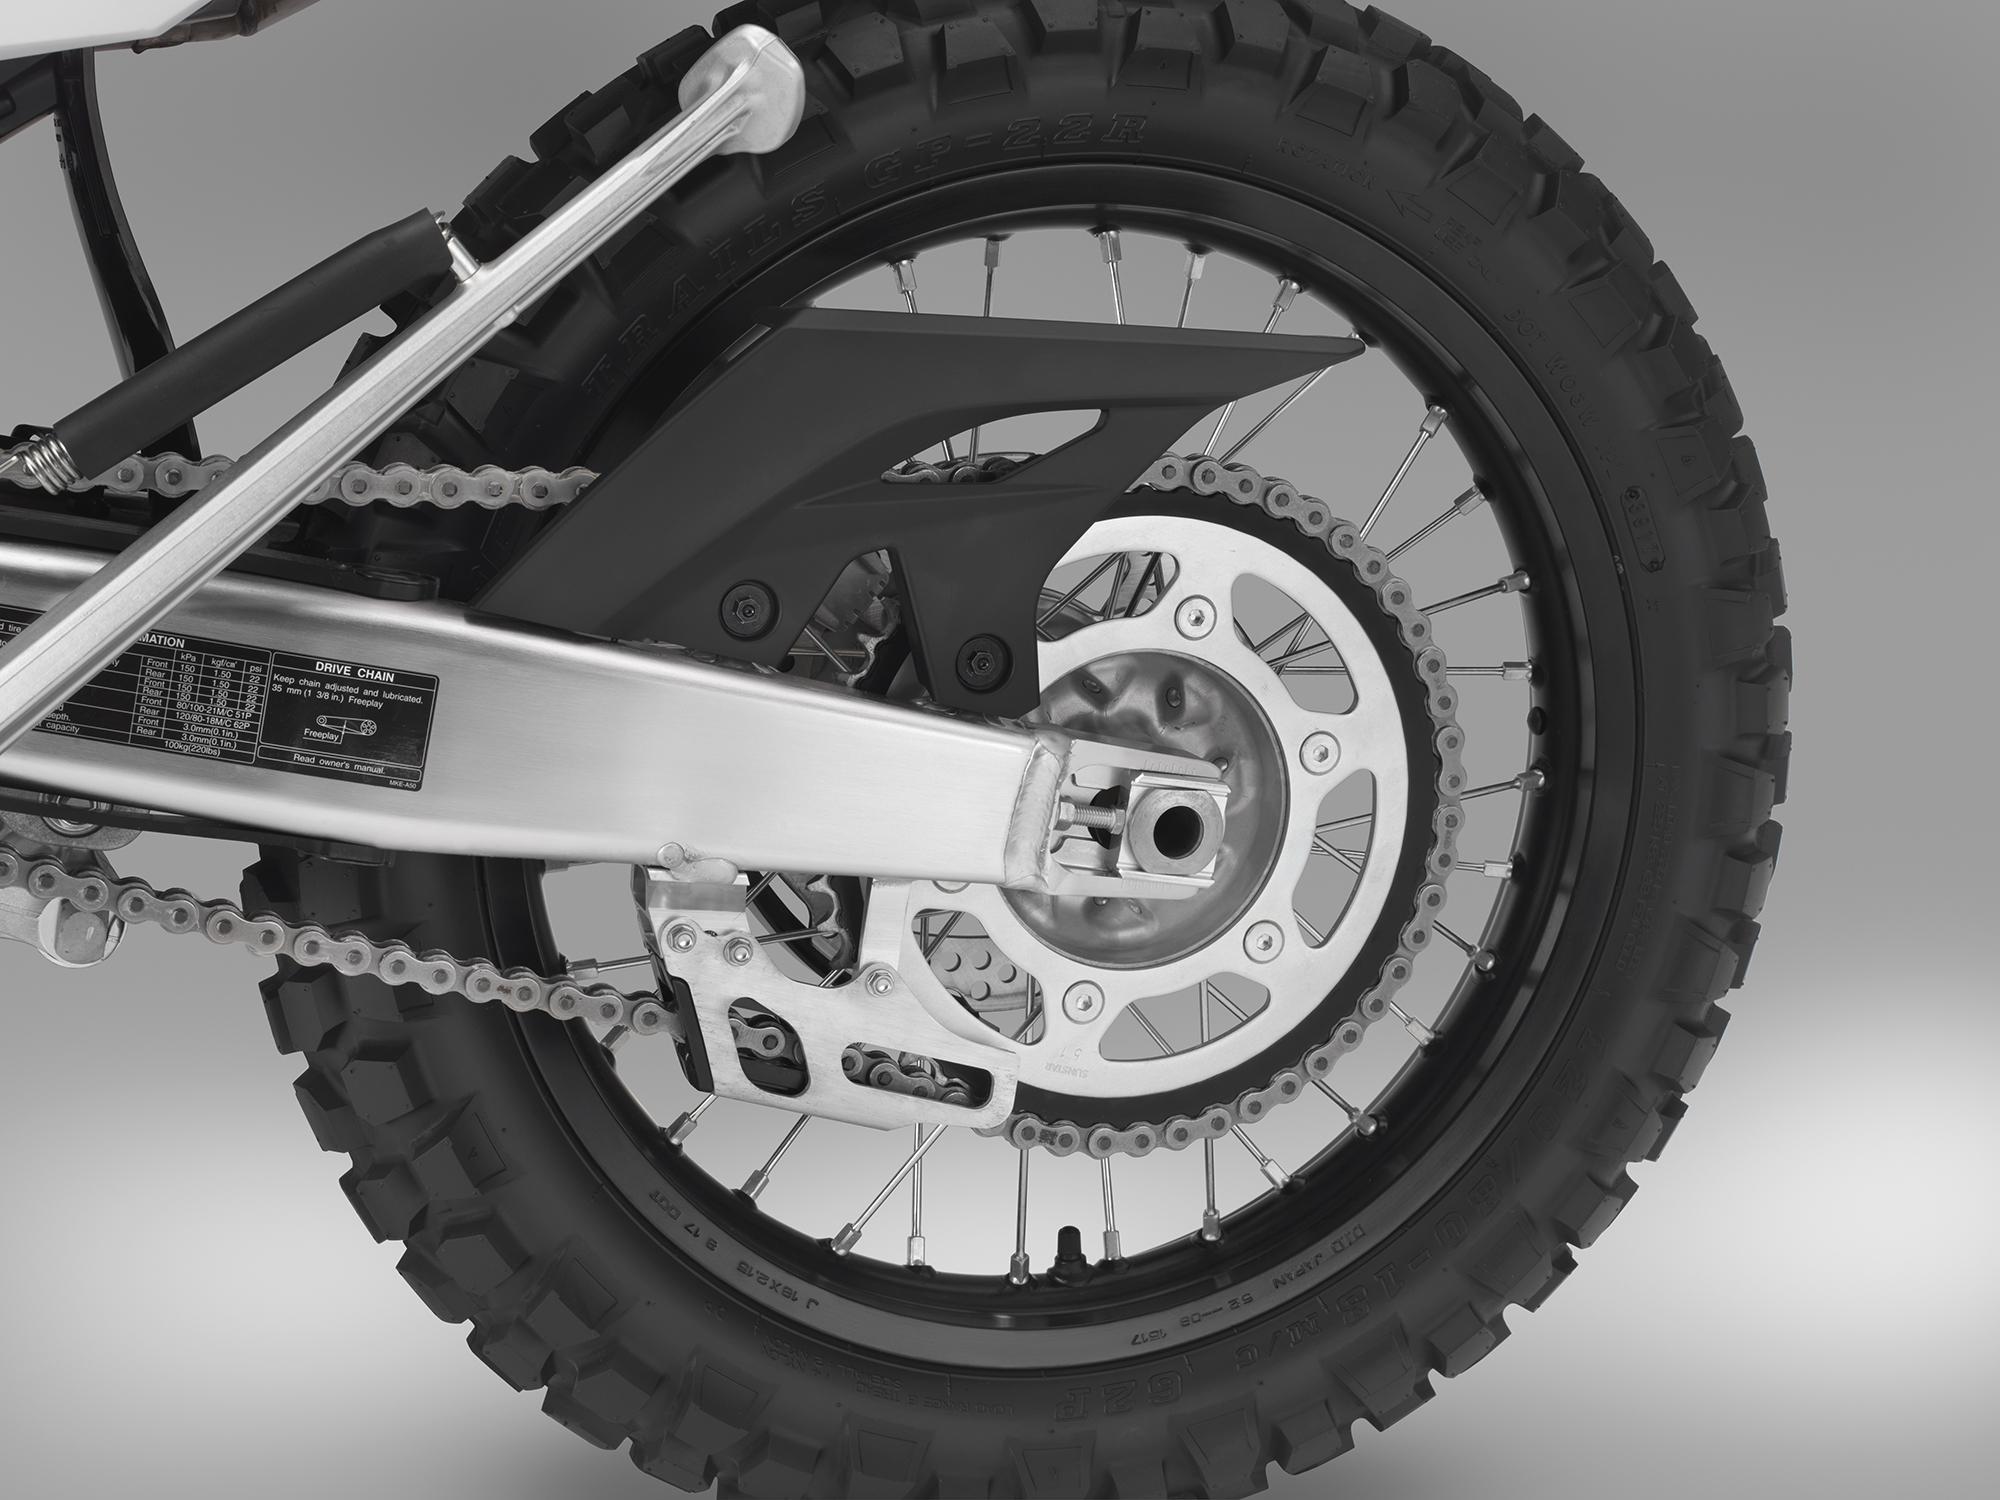 19 Honda CRF450L_chain sprocket.jpg